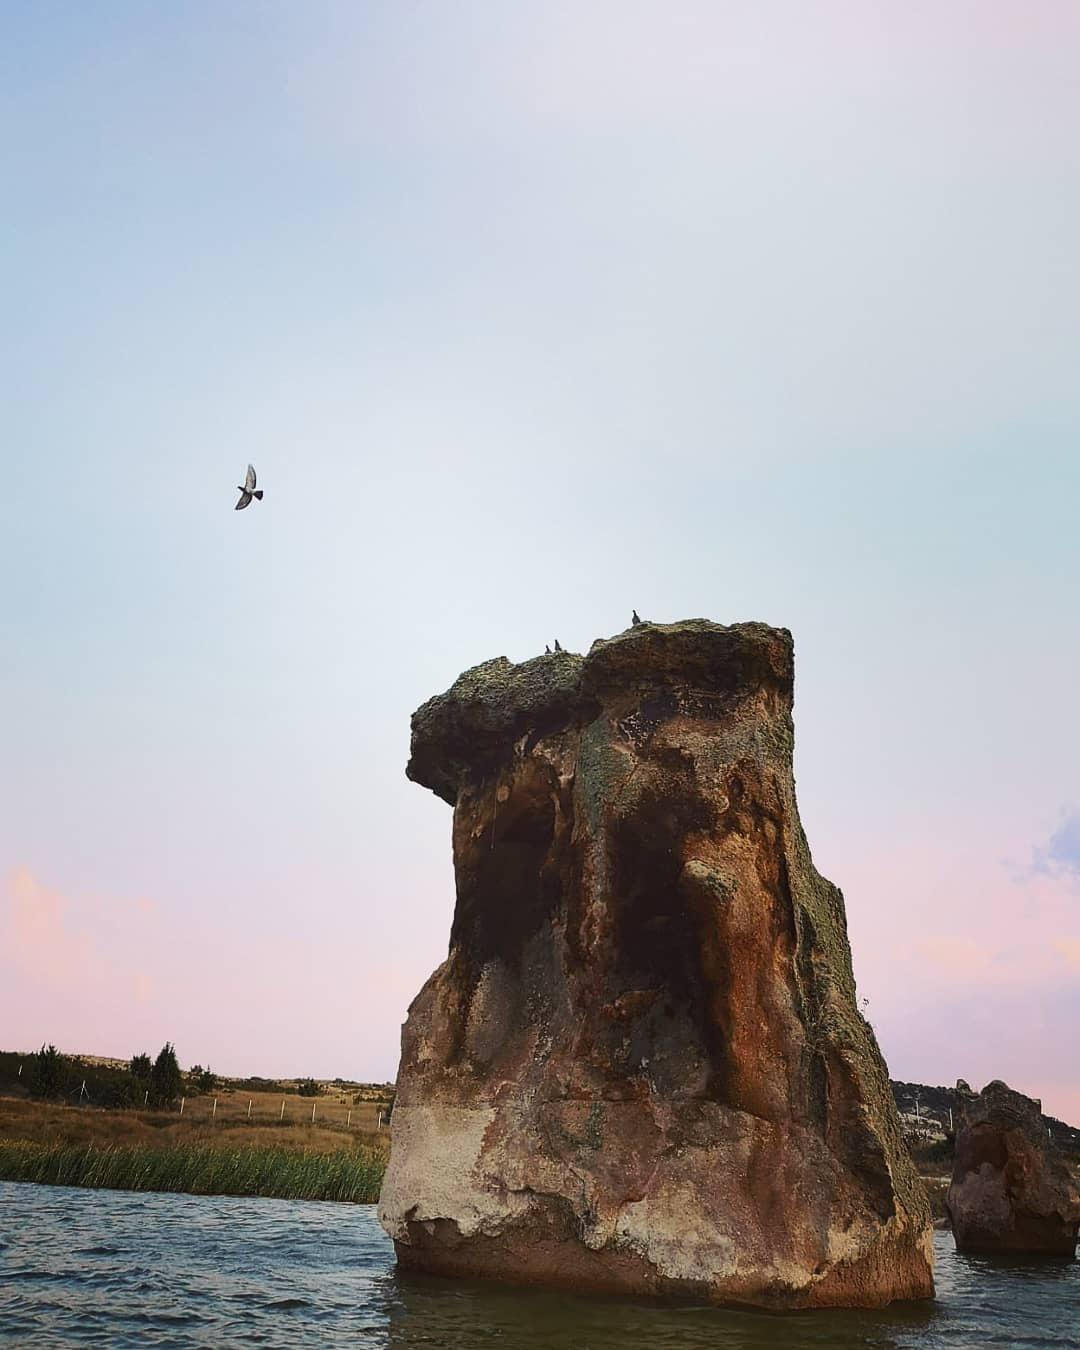 Let's fly.  by Ramazan Özer